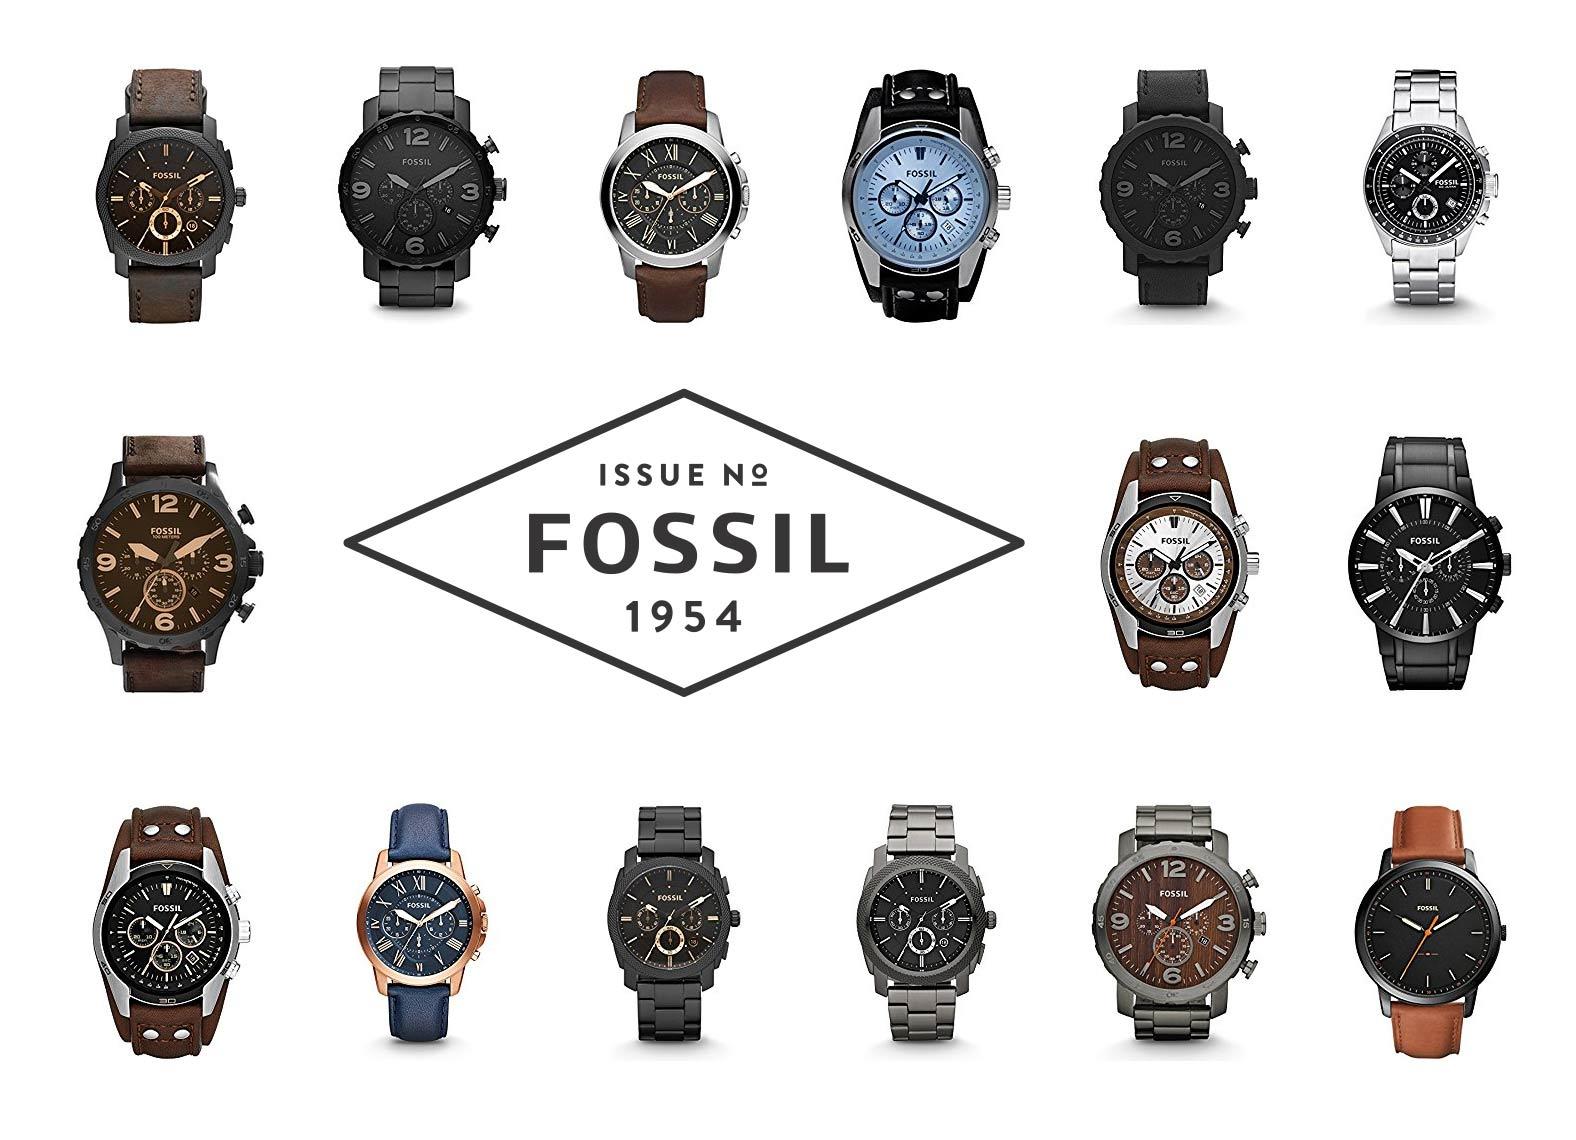 fossil uhren herrenuhren armbanduhren f r m nner. Black Bedroom Furniture Sets. Home Design Ideas